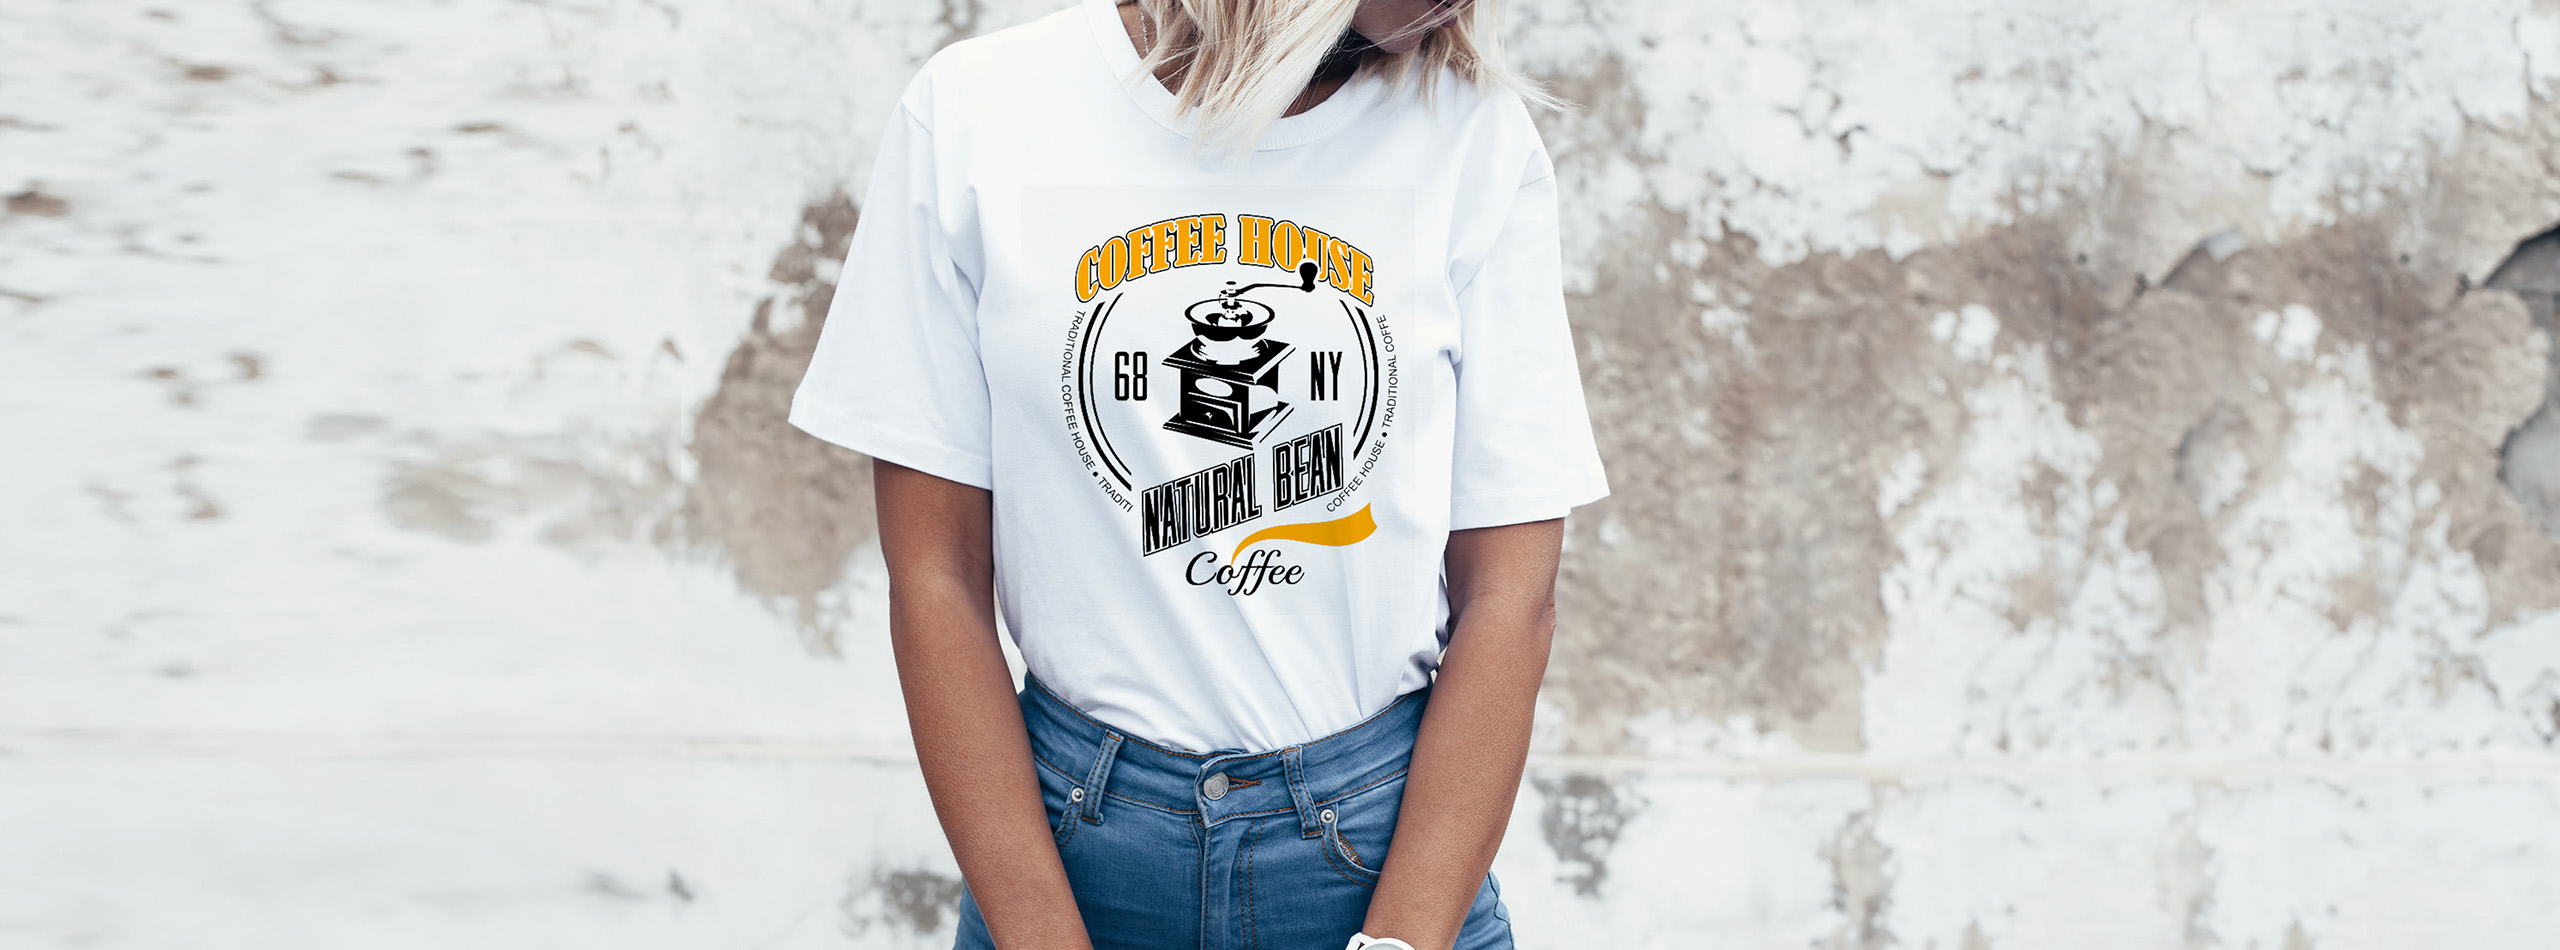 Unisex shirts banner 3